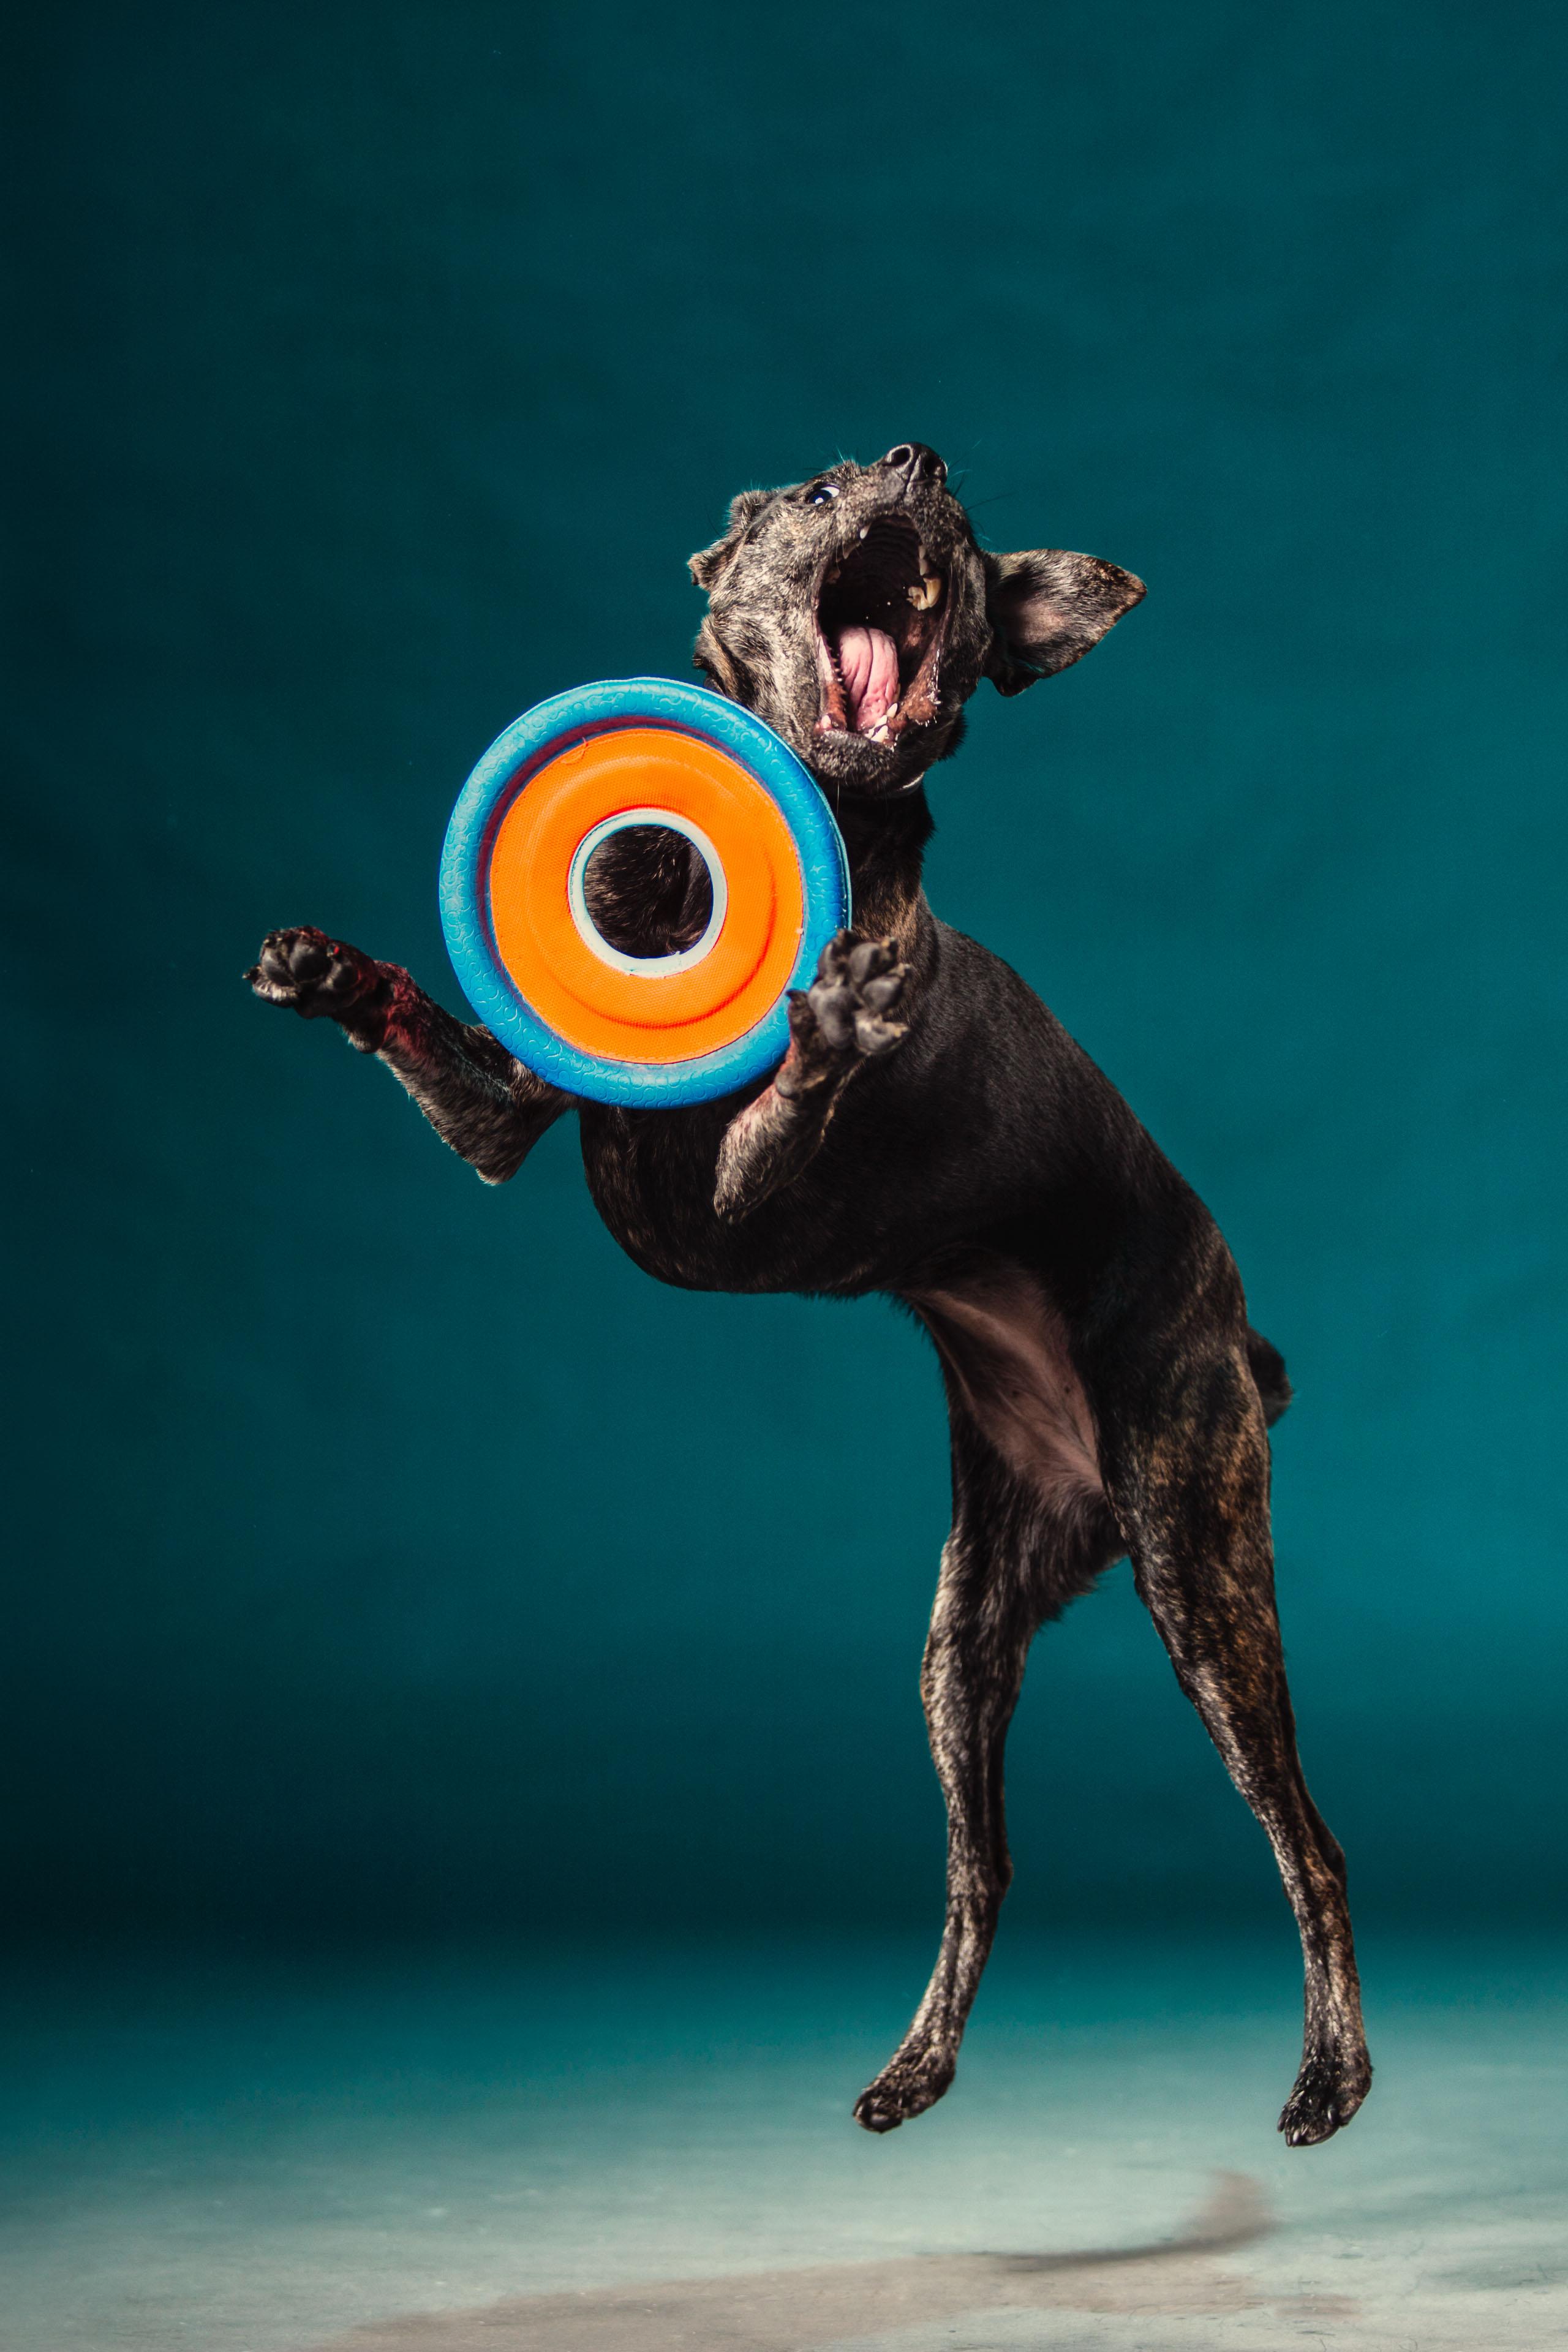 Kona frisbee